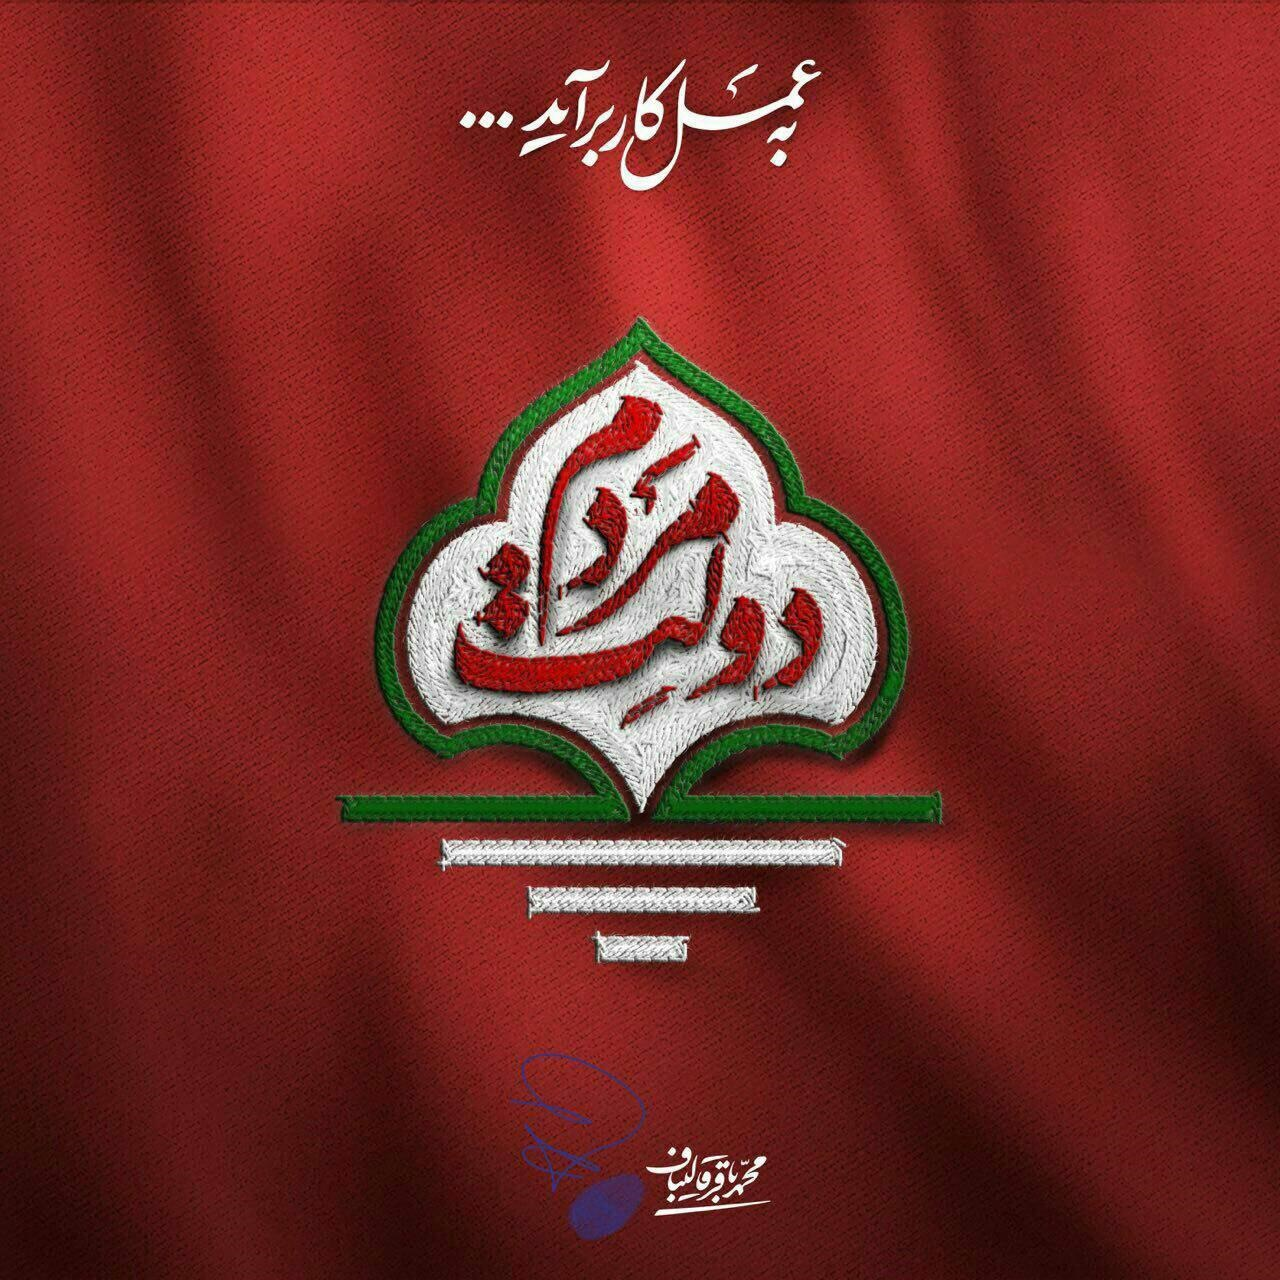 (عکس) نماد و شعار انتخاباتی قالیباف